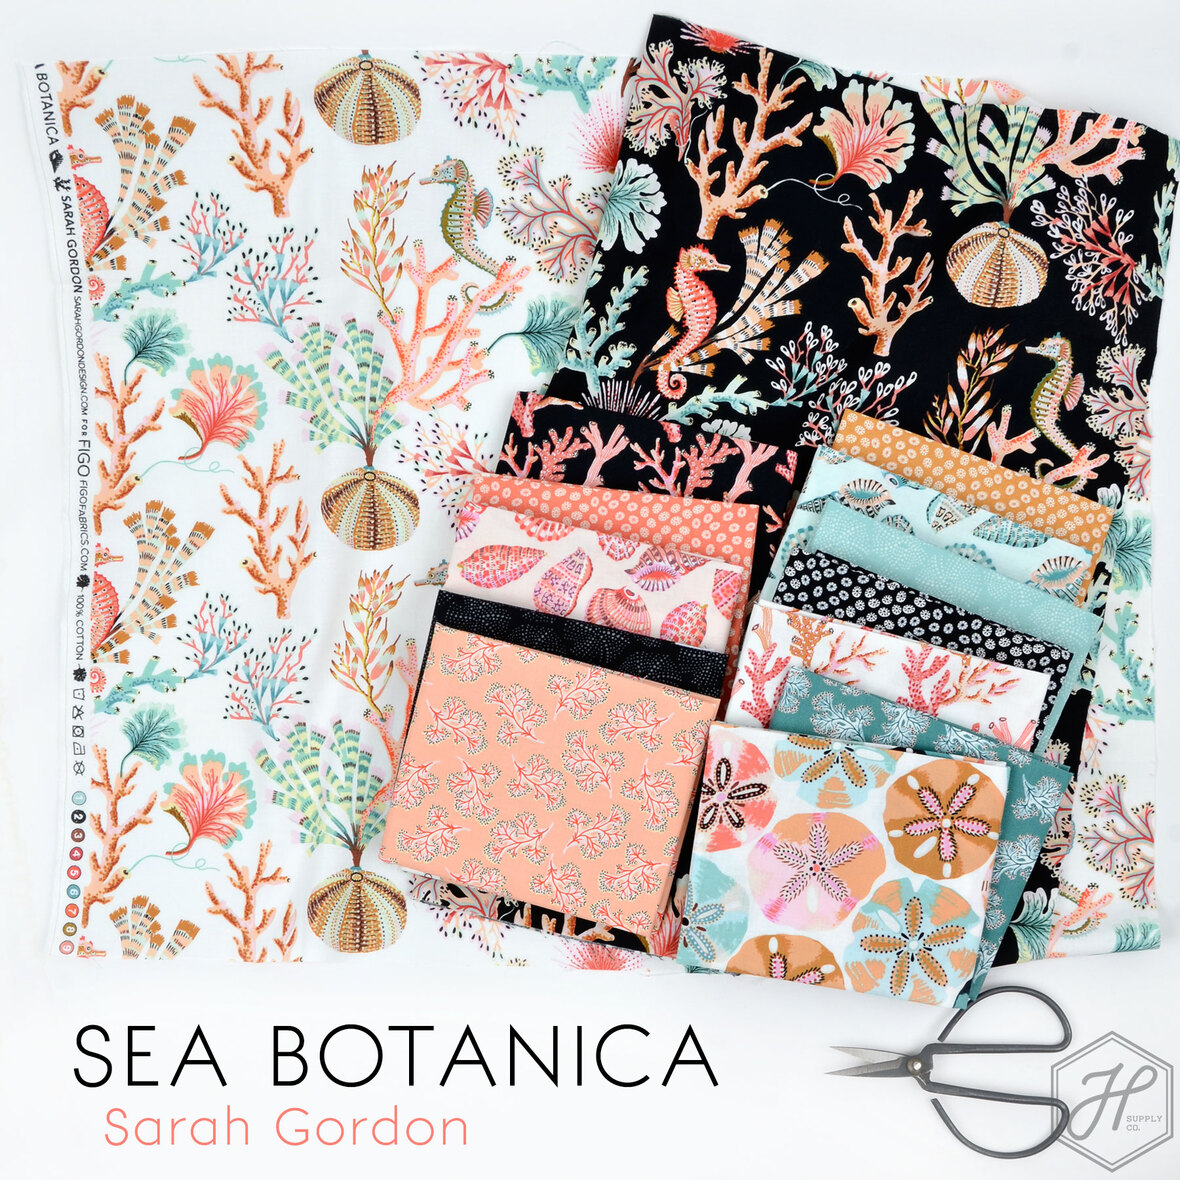 Sea-Botanica-Fabric-Sarah-Gordon-for-Figo-at-Hawthorne-Supply-Co